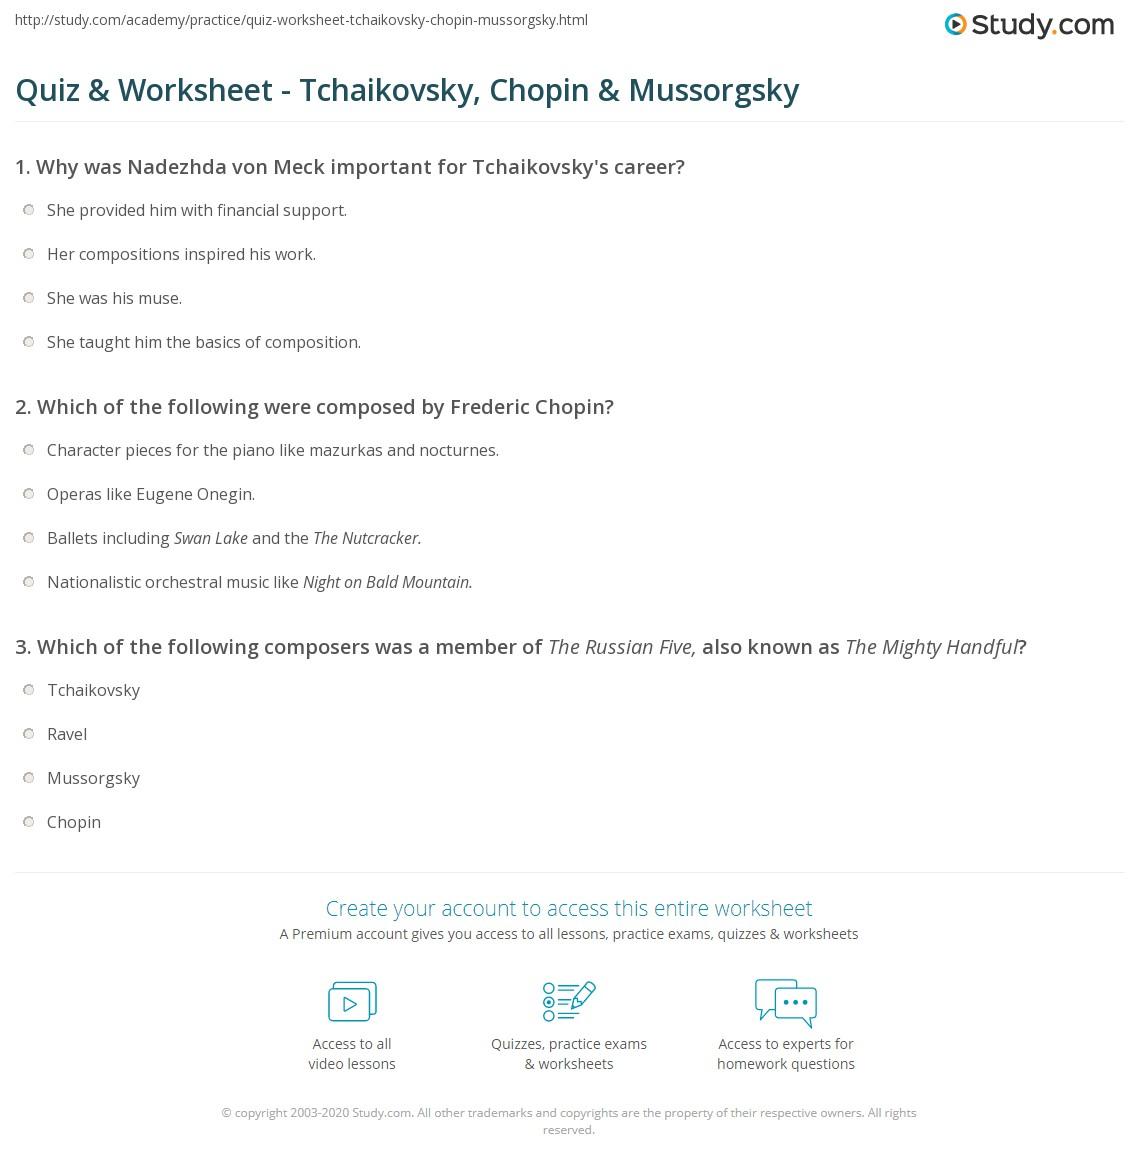 Quiz & Worksheet - Tchaikovsky, Chopin & Mussorgsky | Study com